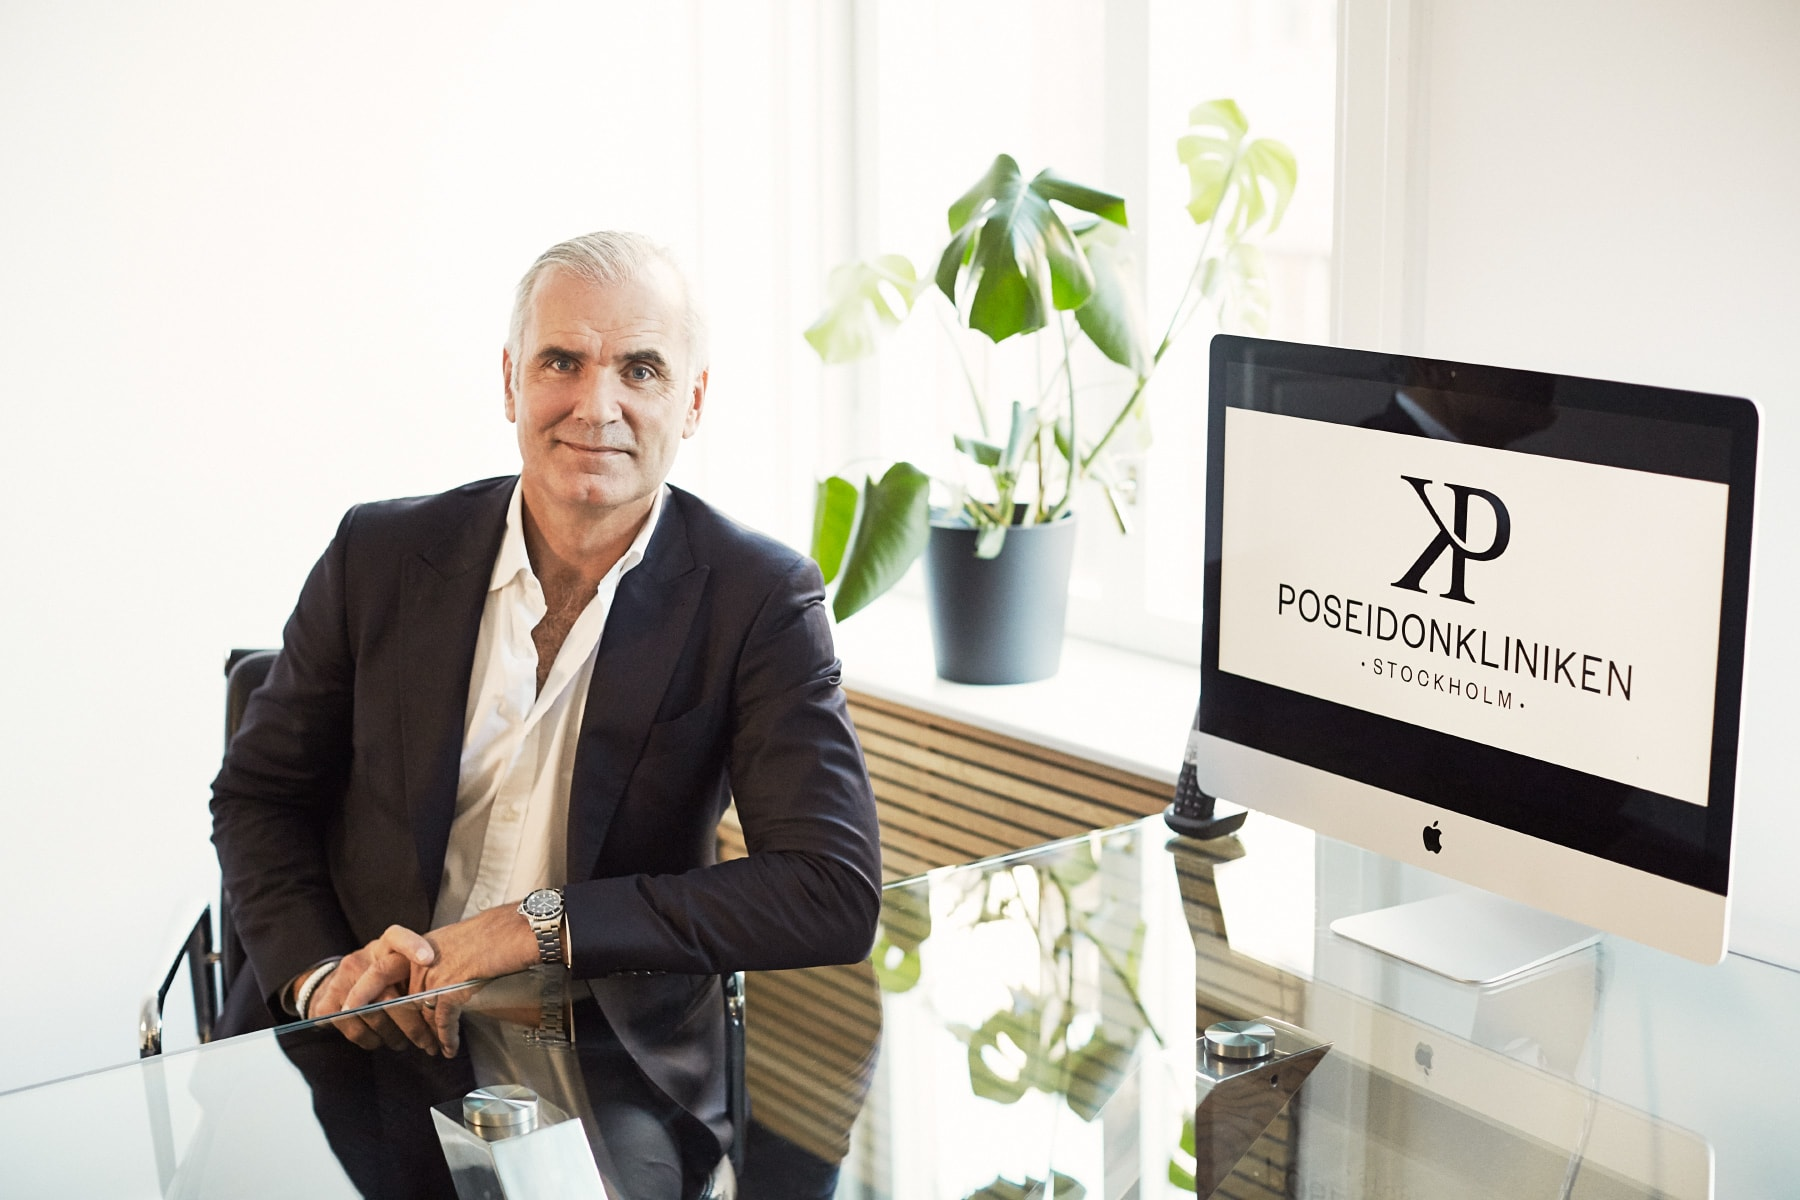 Gustaf Bodin - Hårtransplantation   Poseidonkliniken Stockholm